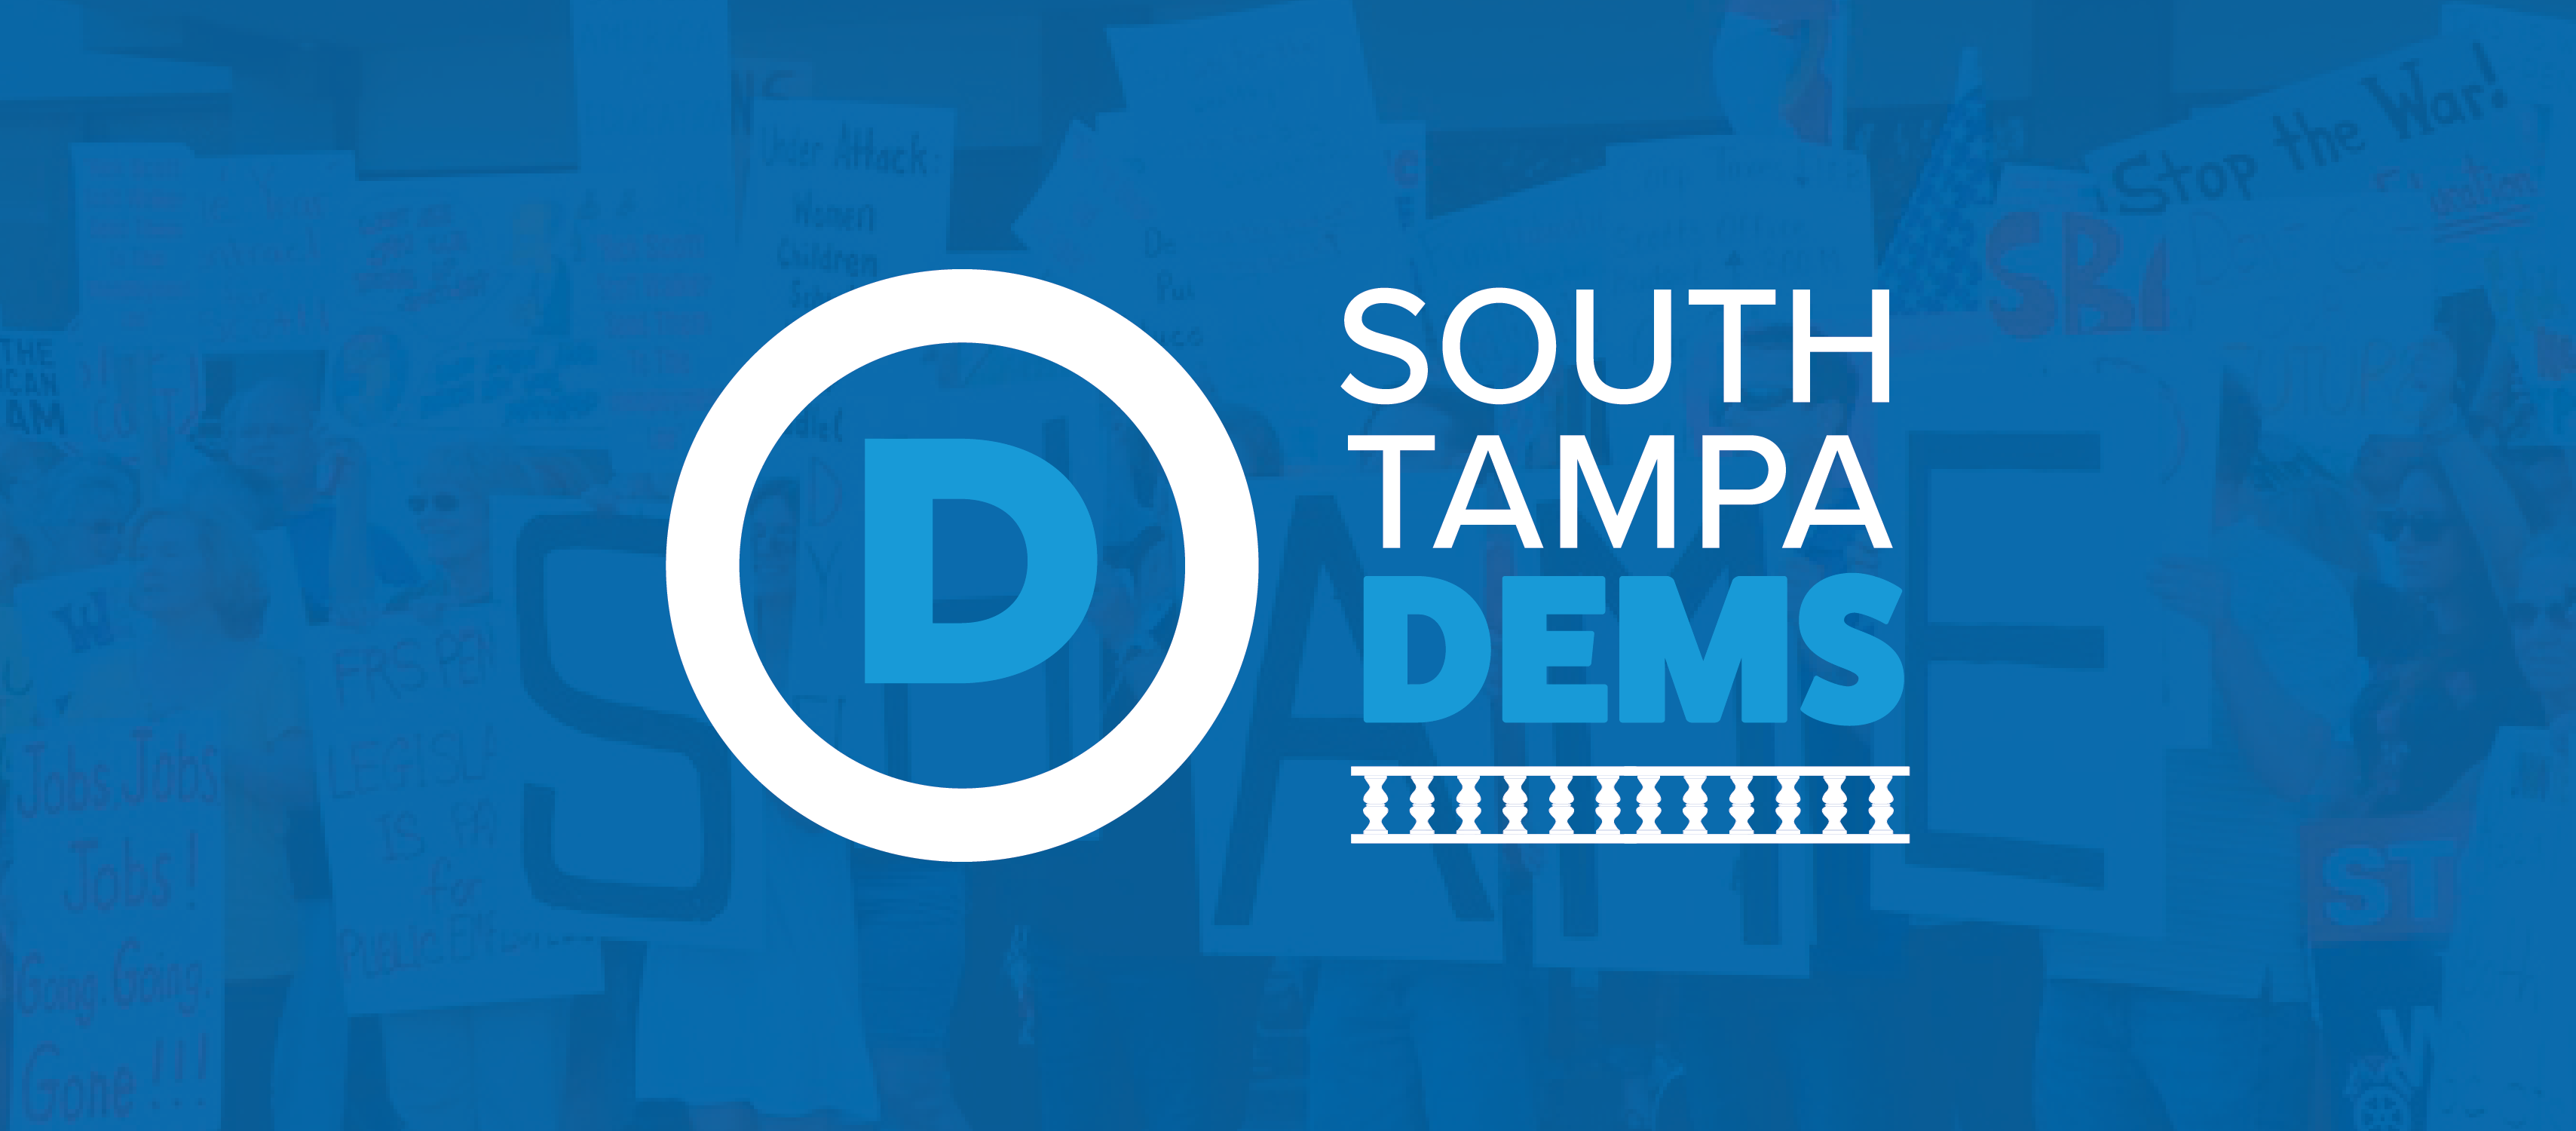 SOUTH TAMPA DEMOCRATIC CLUB